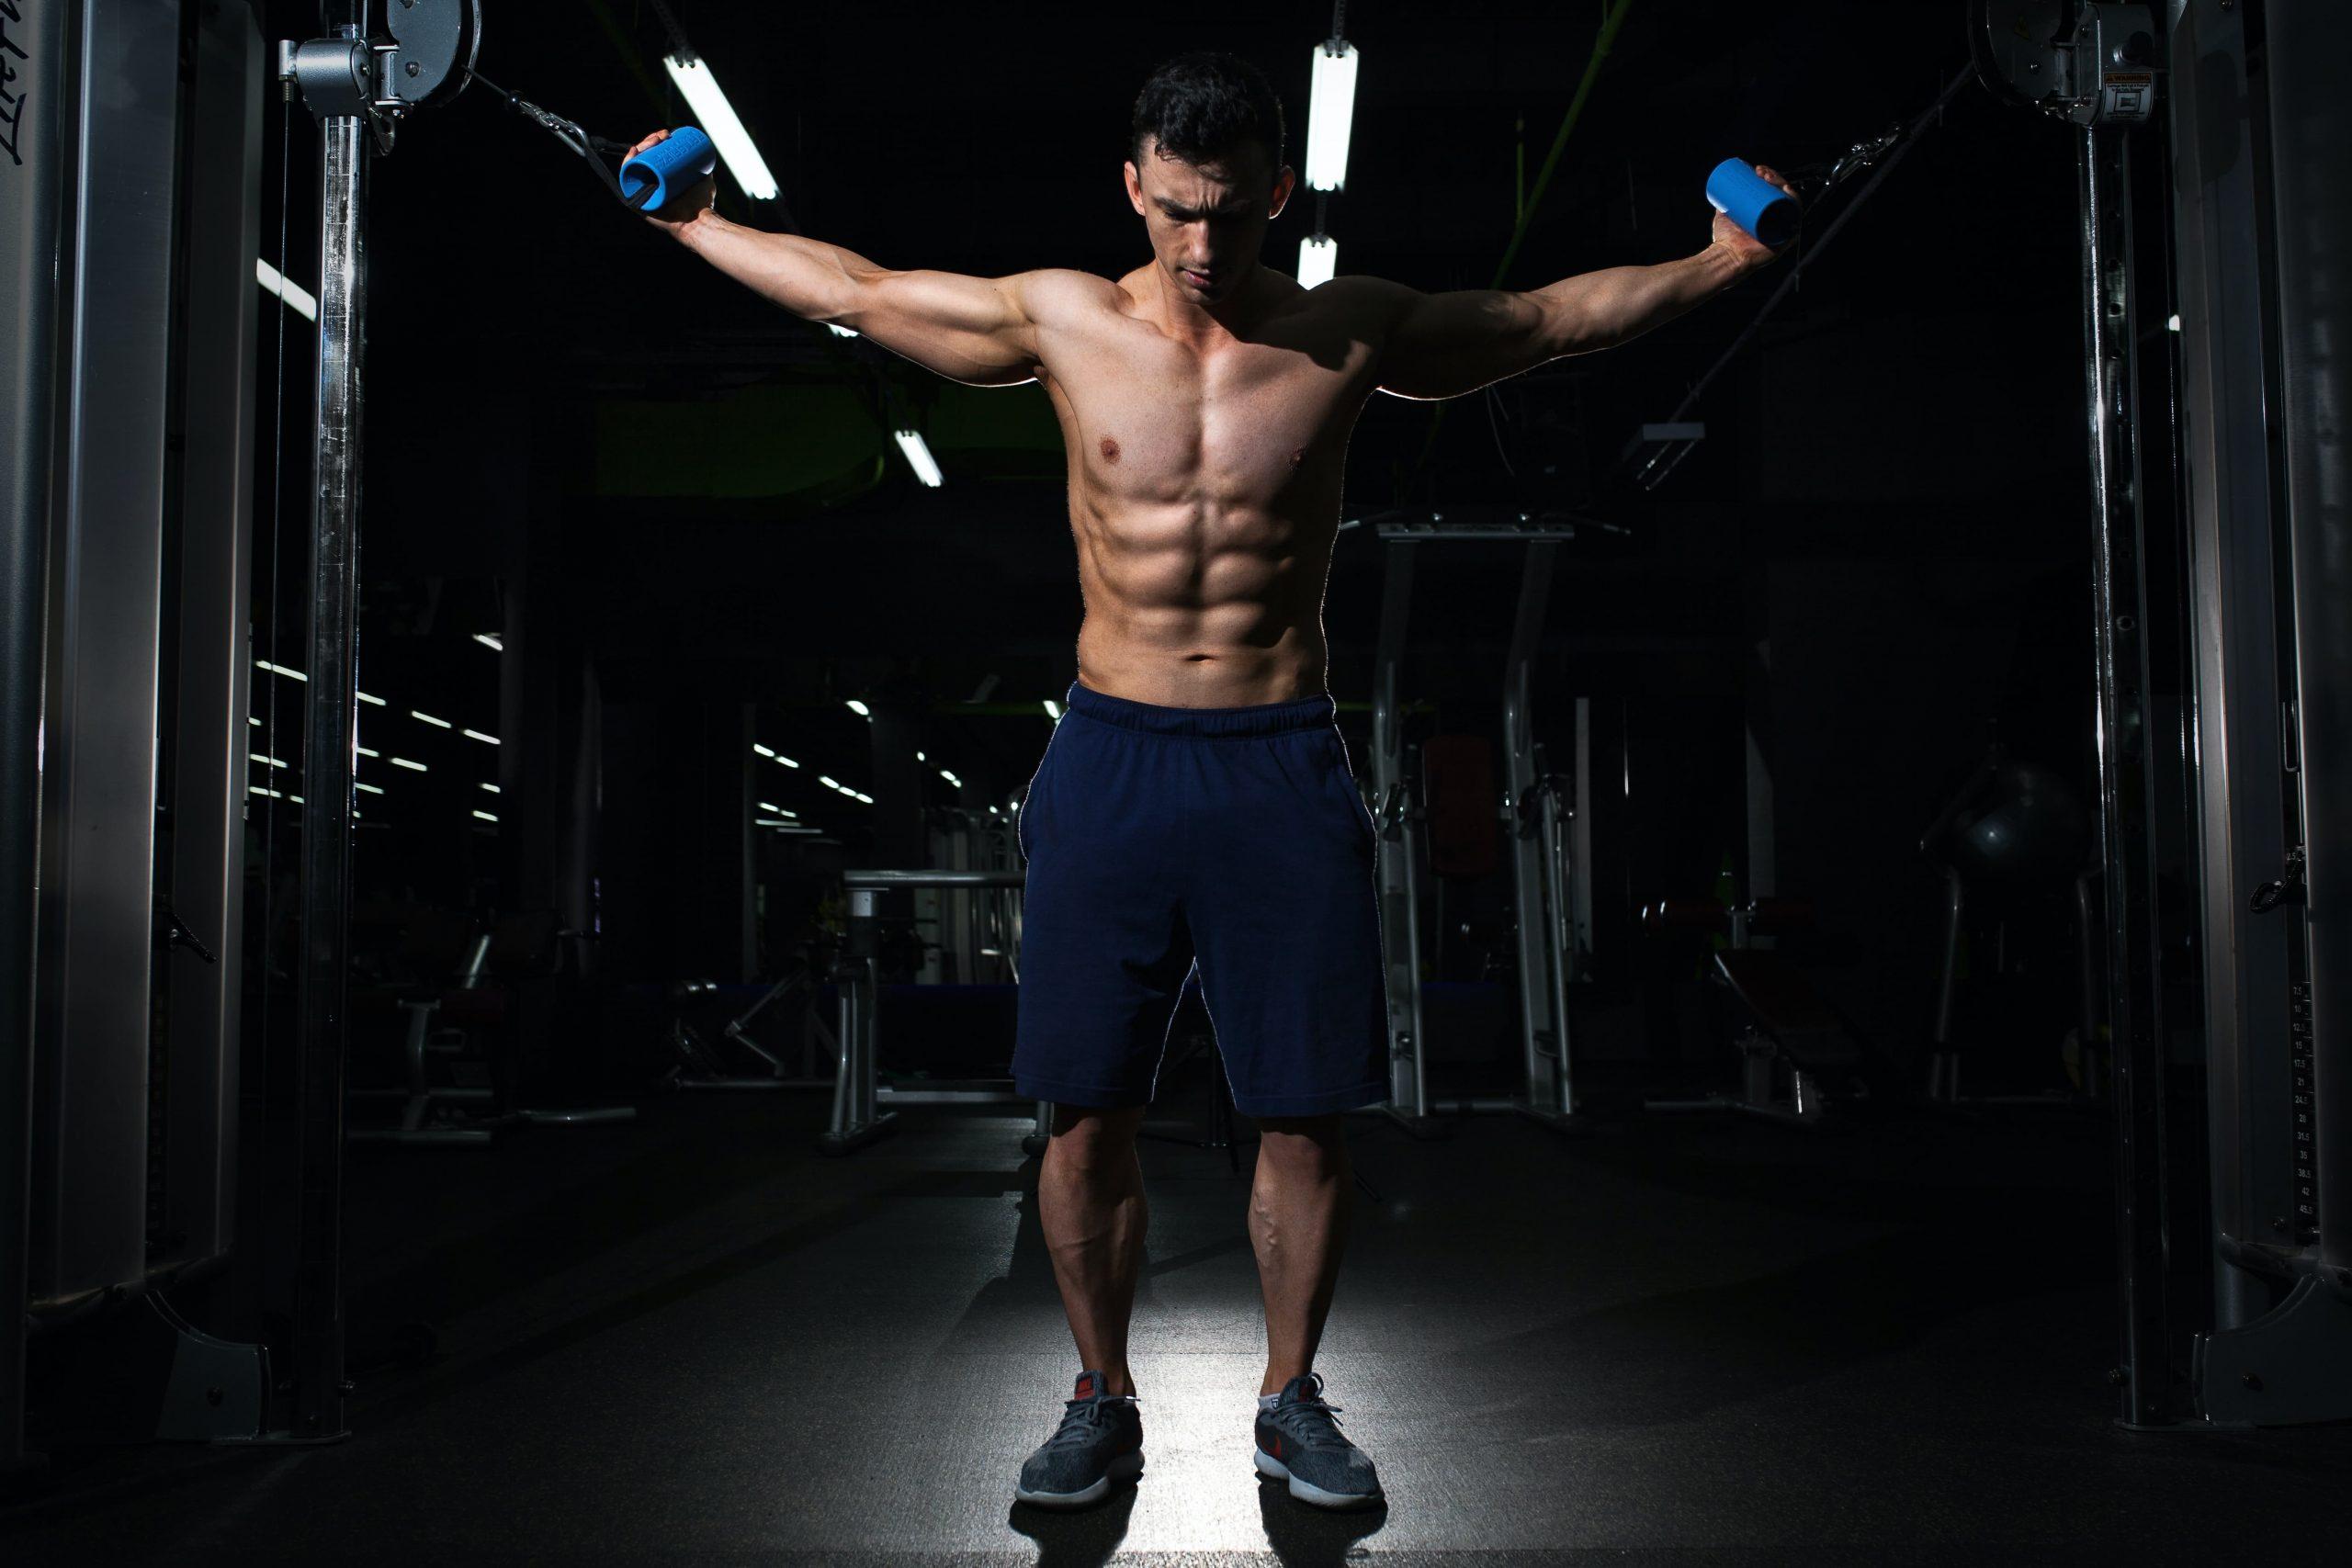 Workout, WORKOUT SUPPLEMENTS FOR BEGINNERS, Ntoofitness